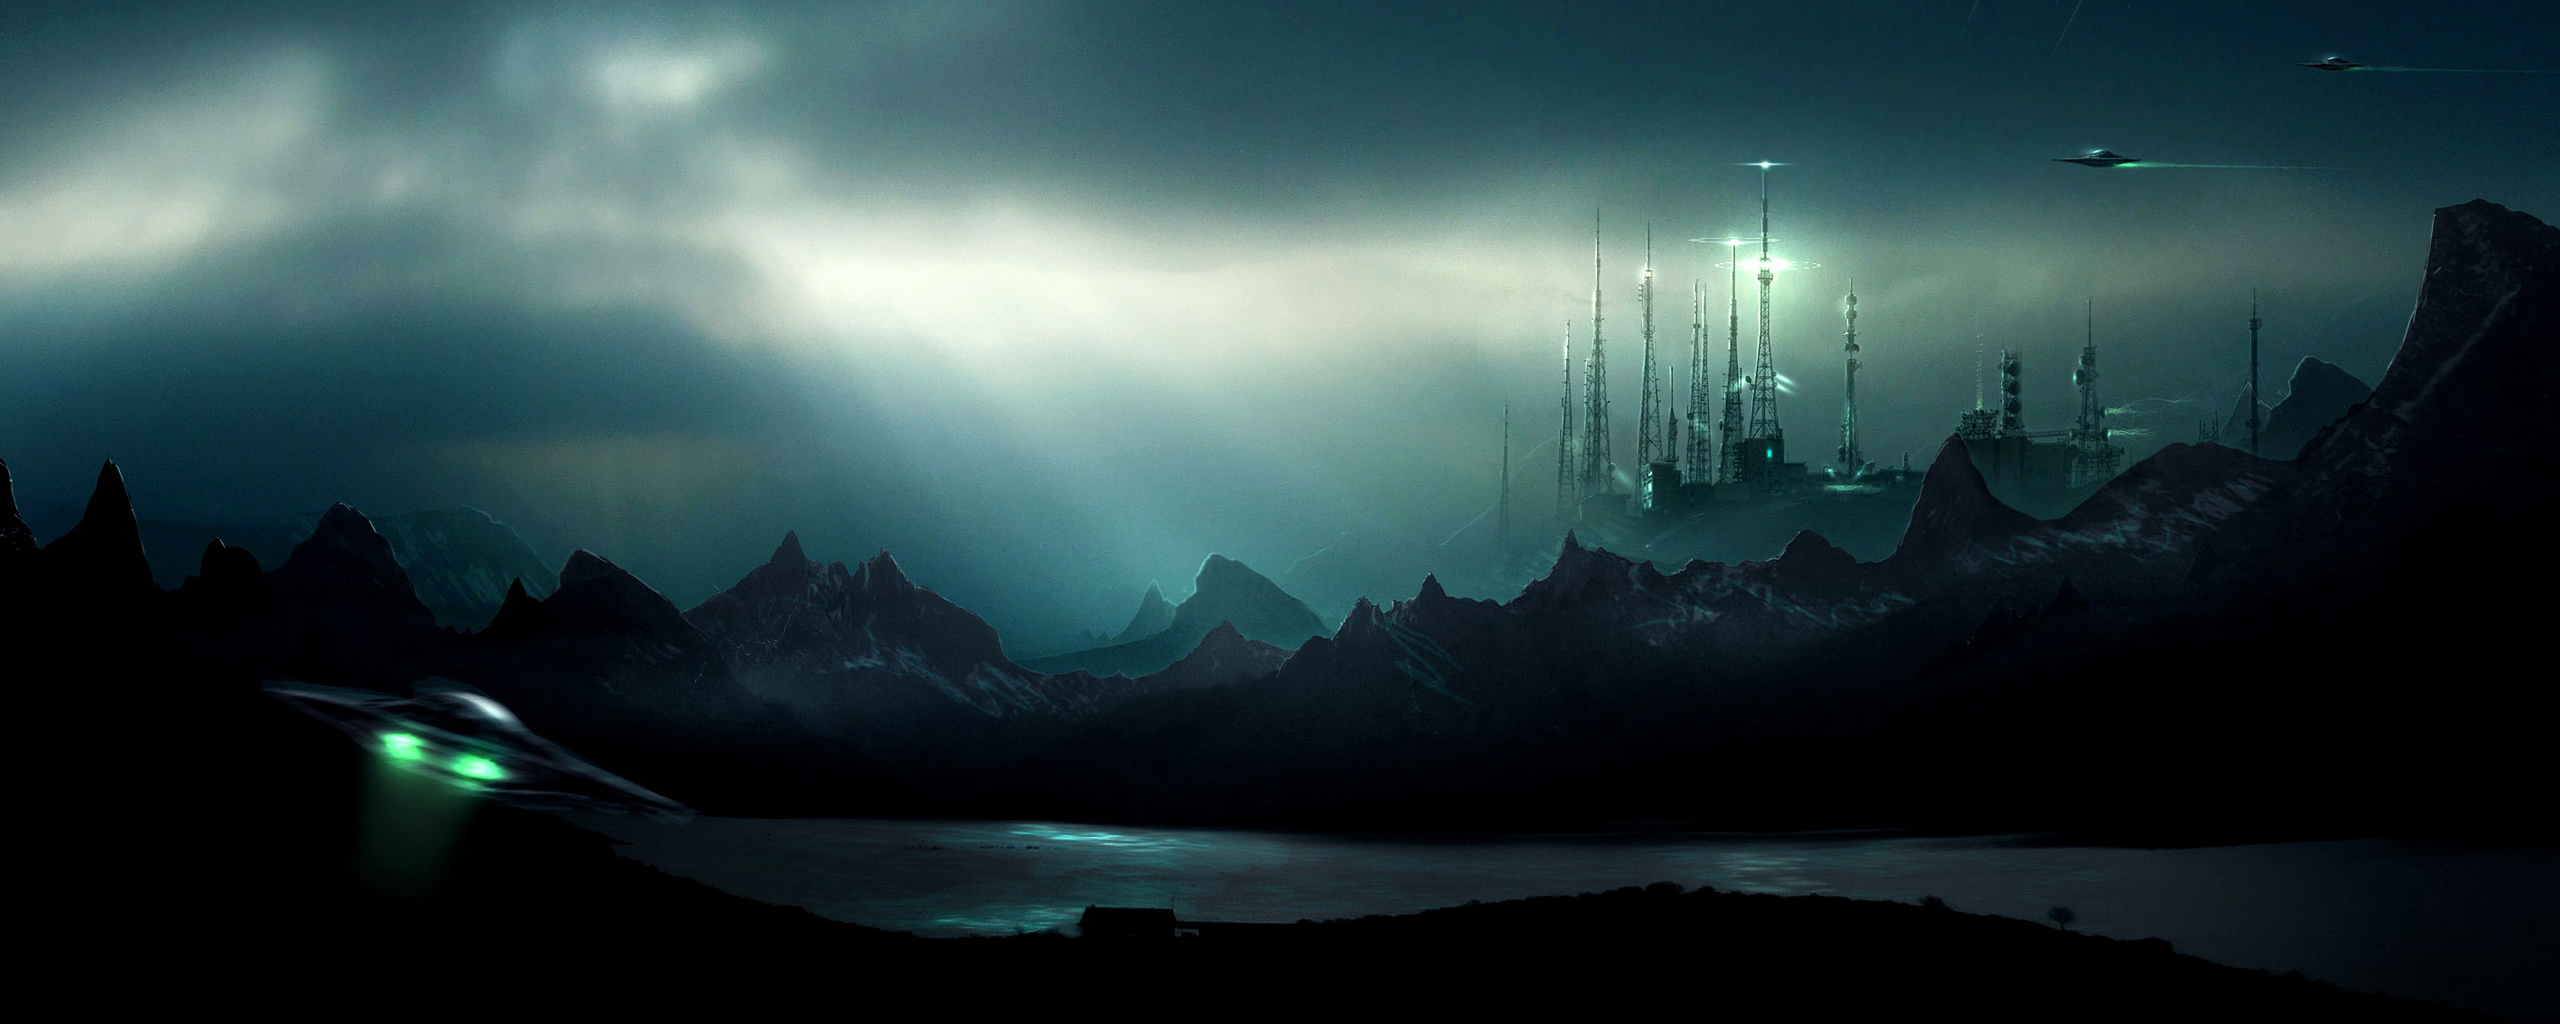 panoramic landscape wallpapers wallcoo multi monitor panorama